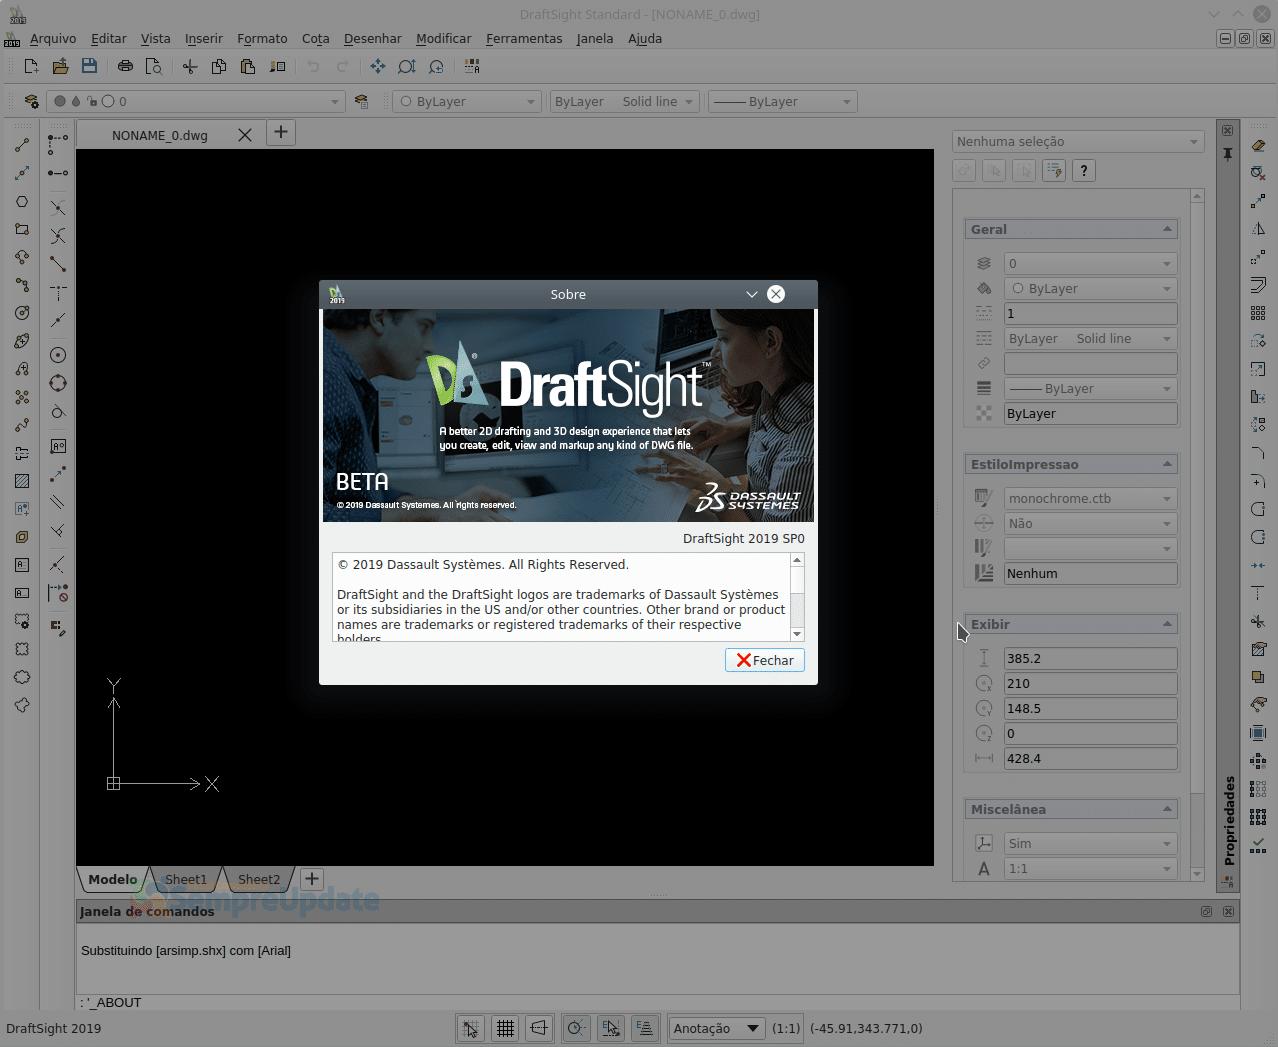 Como Instalar Draftsight No Ubuntu Debian Linux Mint Autocard 2019 1